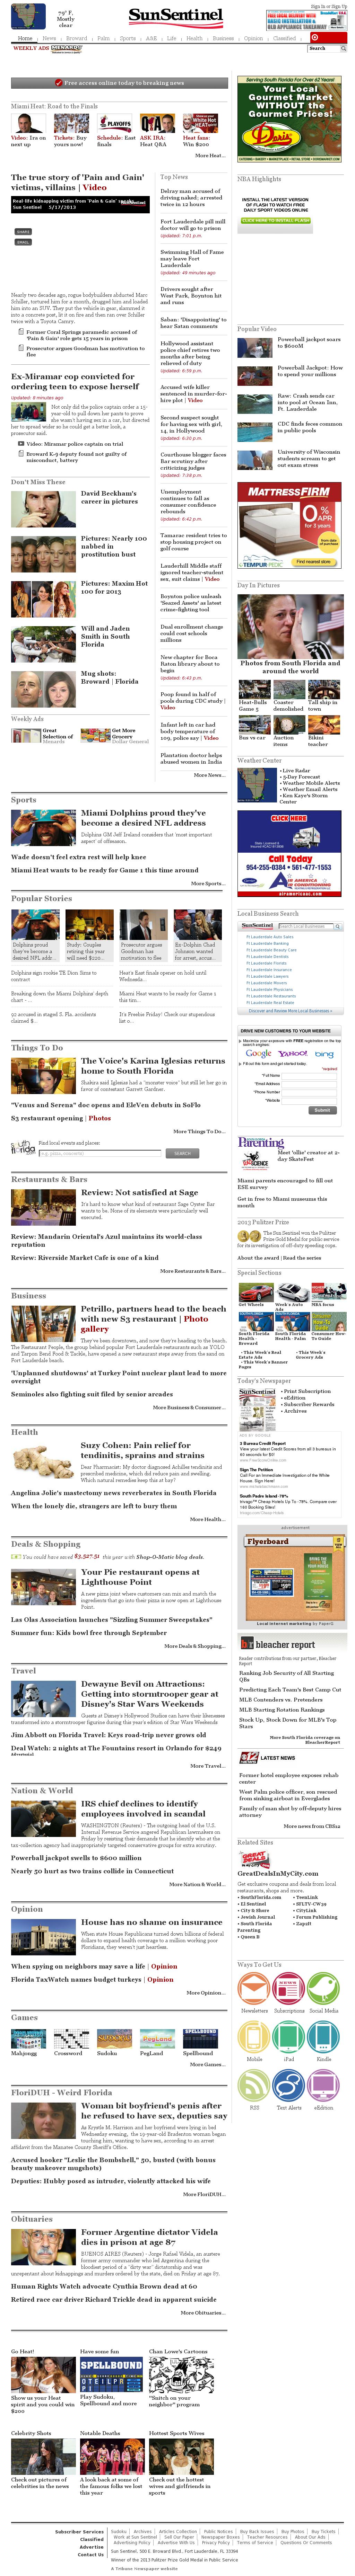 (Florida) Sun Sentinel at Saturday May 18, 2013, 1:24 a.m. UTC